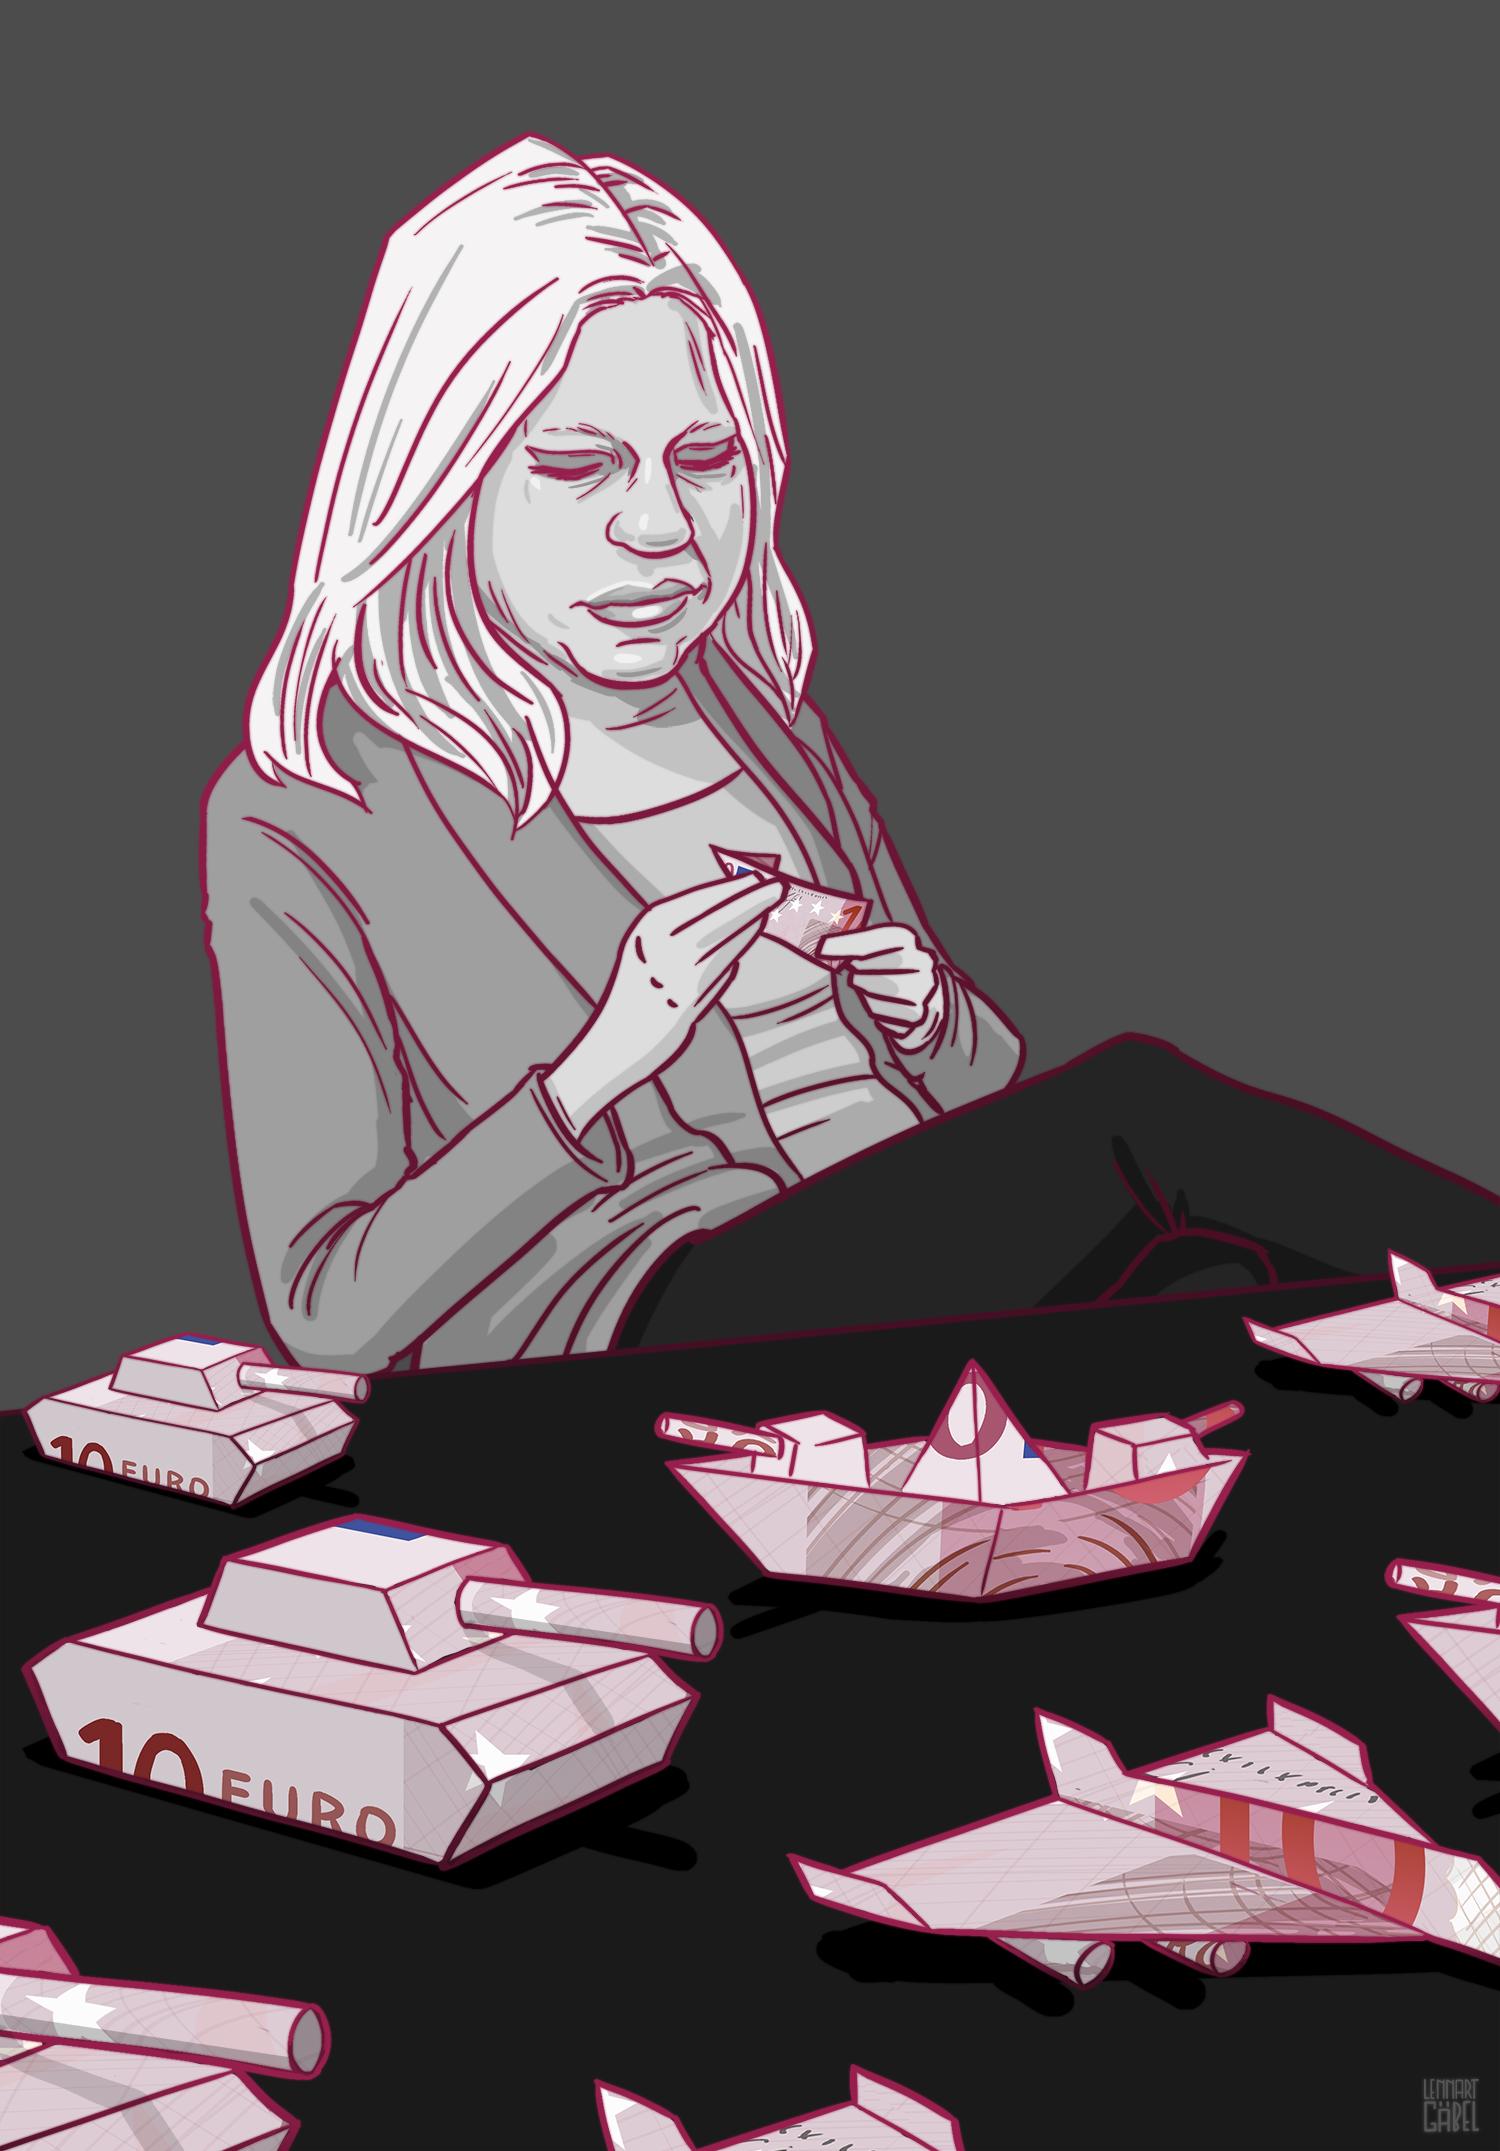 141112_Trouw_Jeanine_Hennis_Karikatuur_Lennart_Gaebel_Illustration.jpg